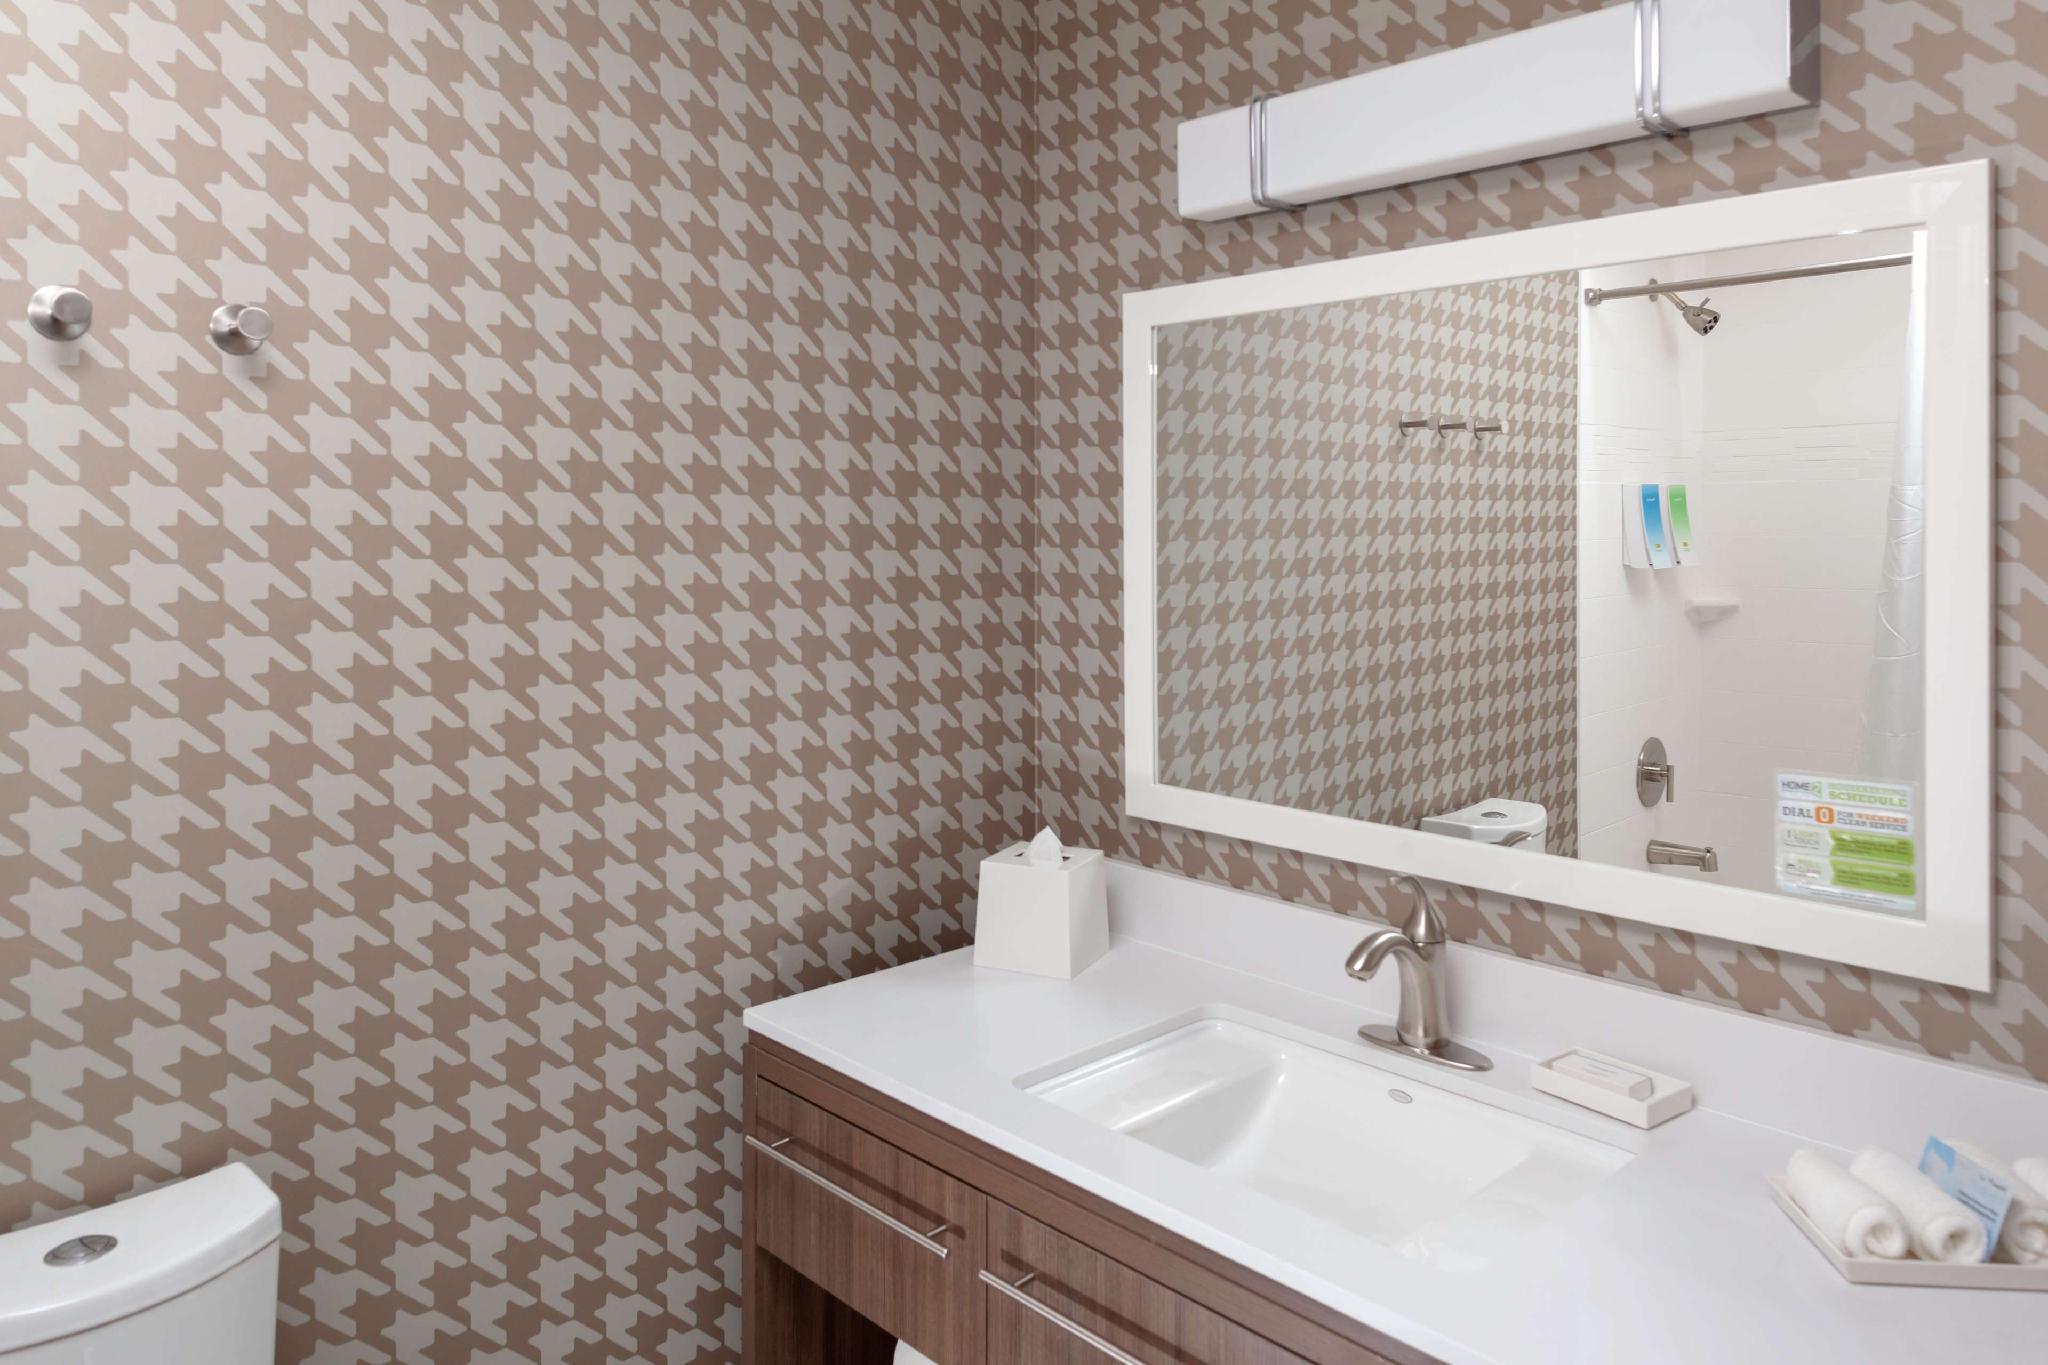 Home2 Suites By Hilton San Antonio Riverwalk